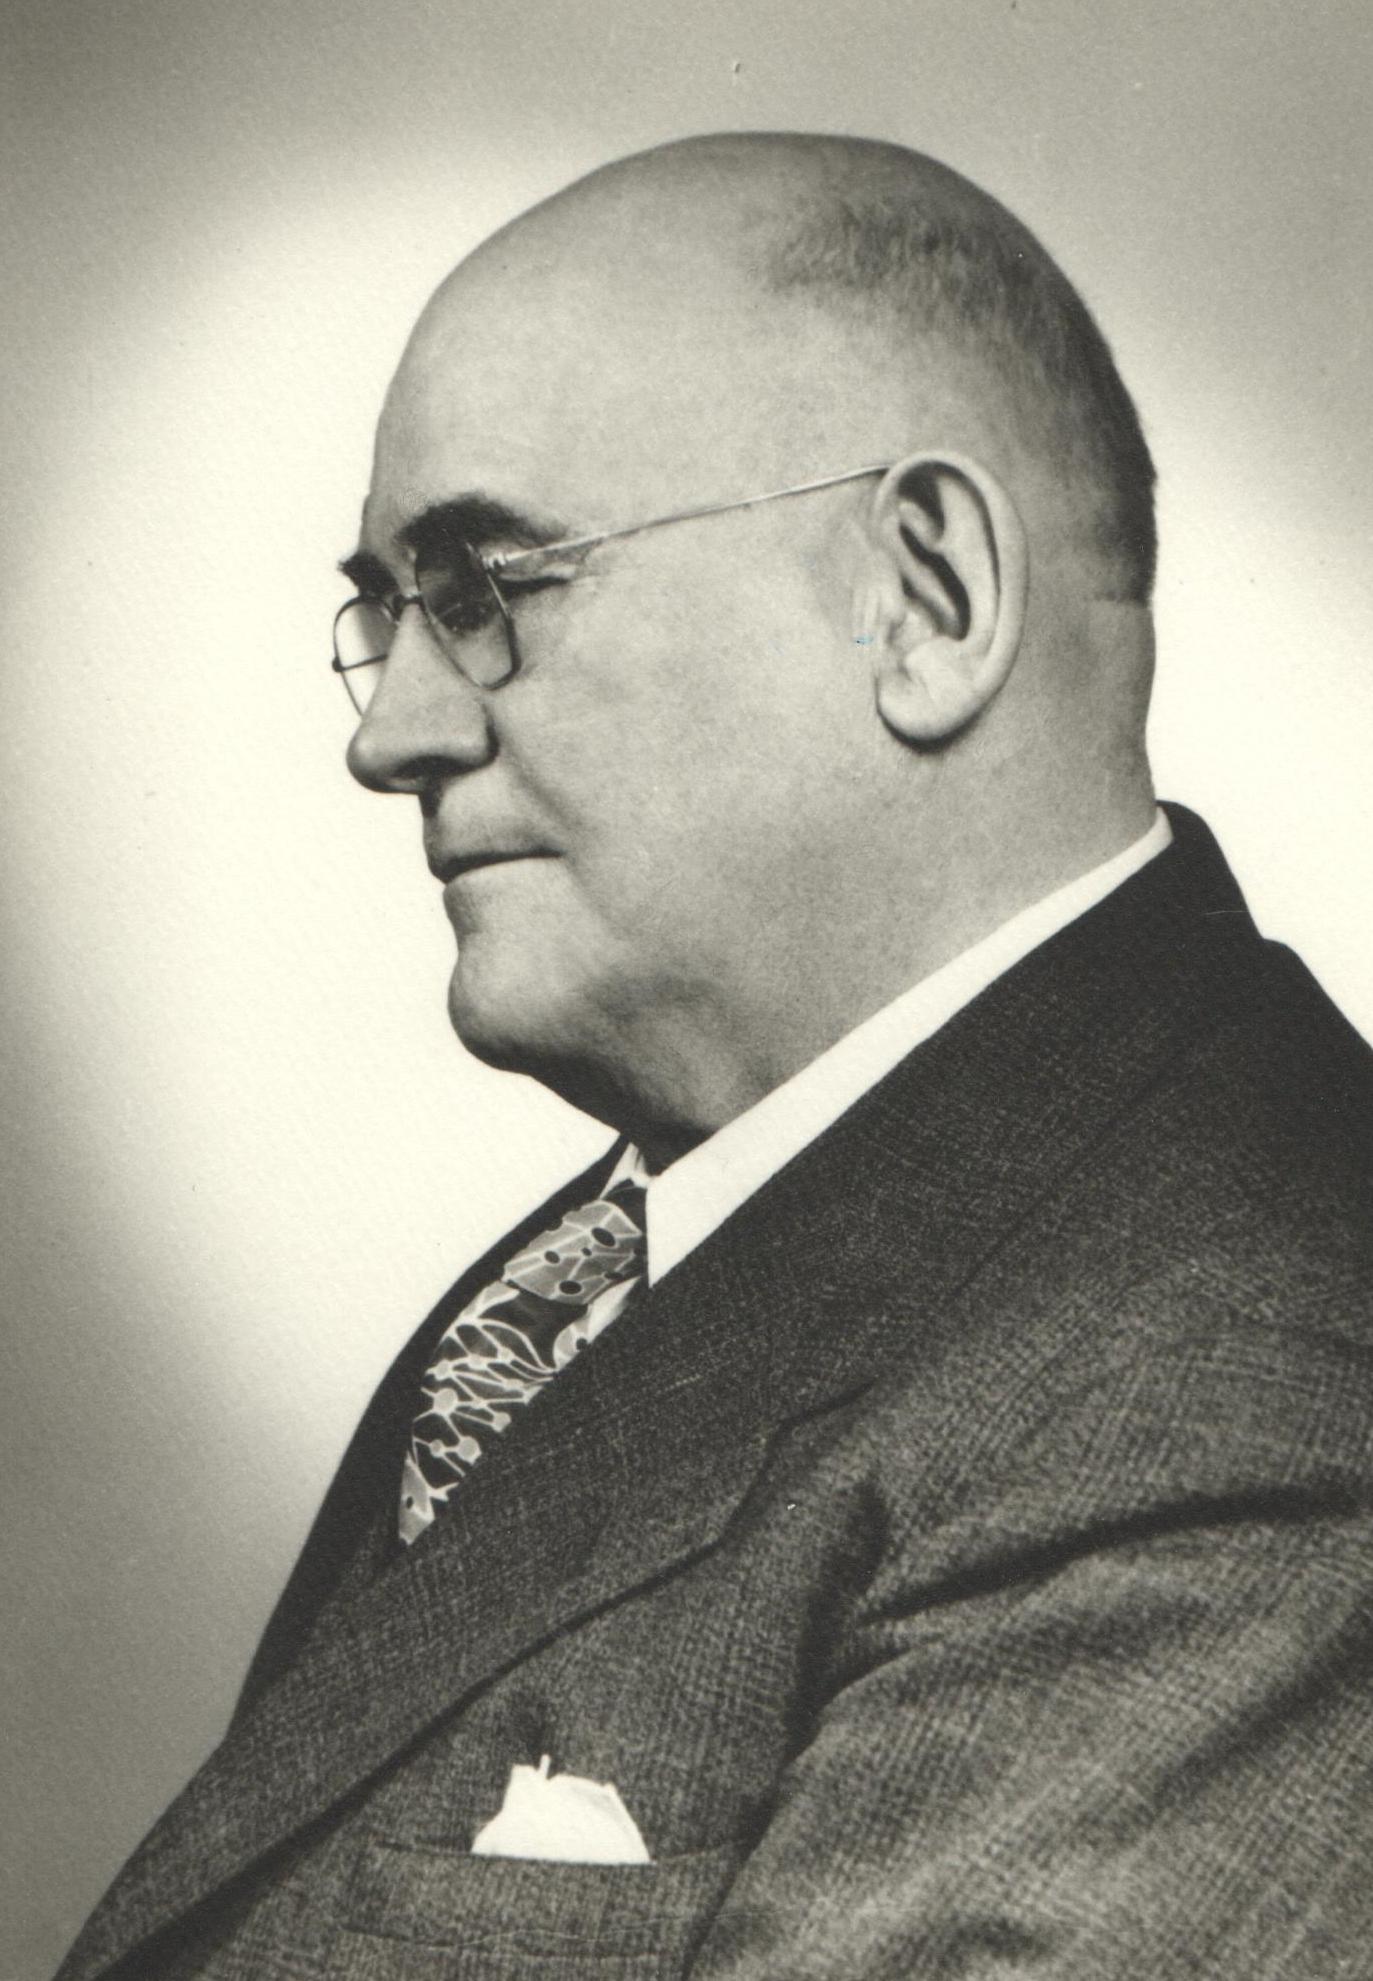 1915 G. E. Peterson